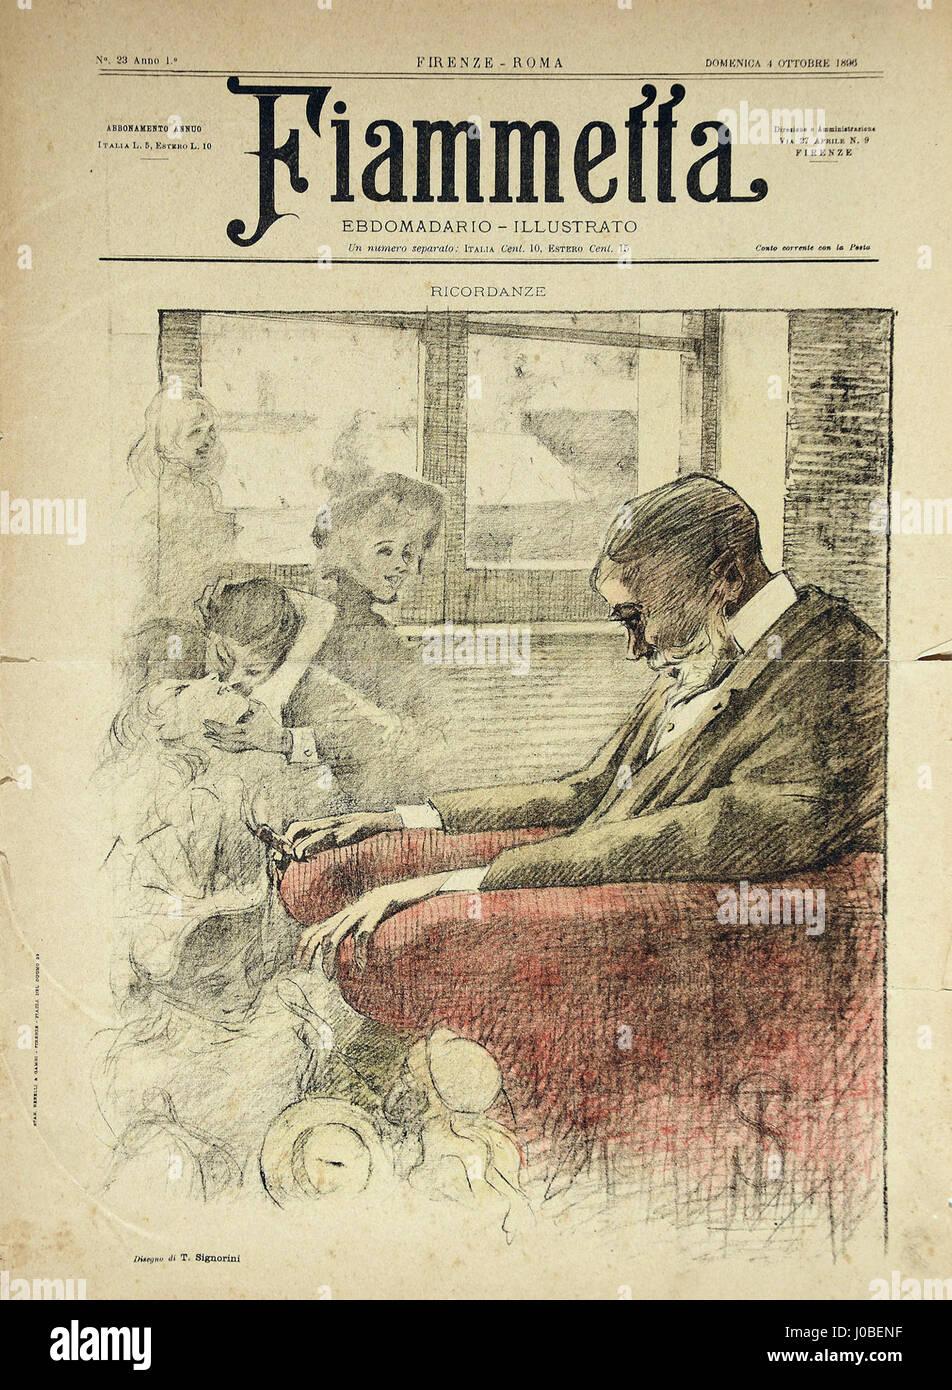 Telemaco Signorini - Ricordanze, ilustração para o periódico Fiammetta Foto de stock